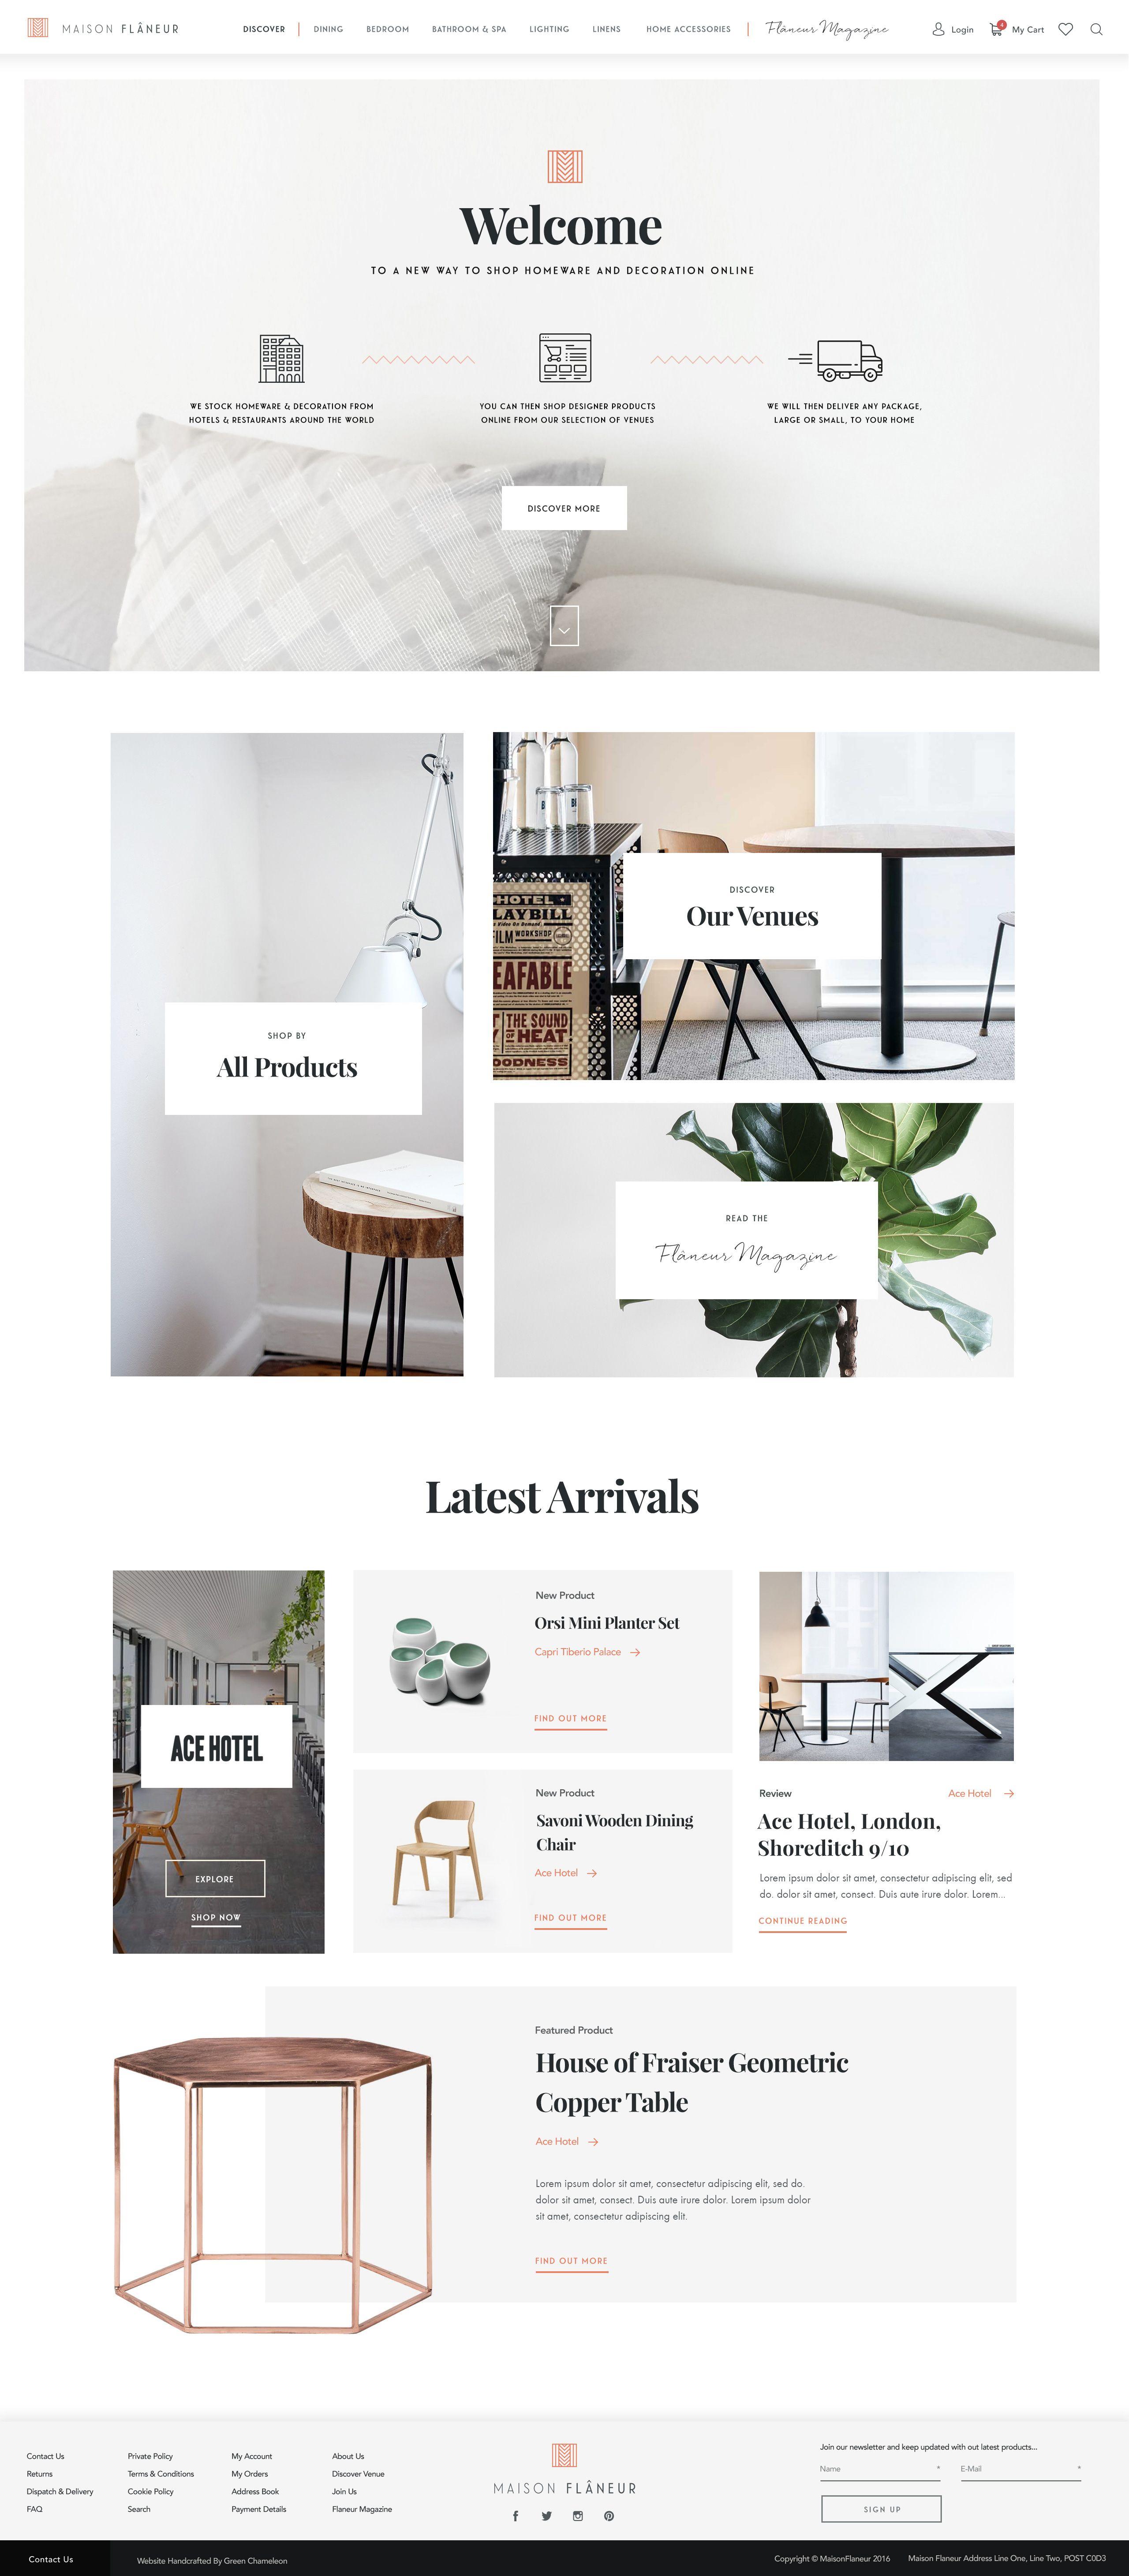 Icon Shot X Light Maison Flaneur Homepage Web Design Webdesign Design